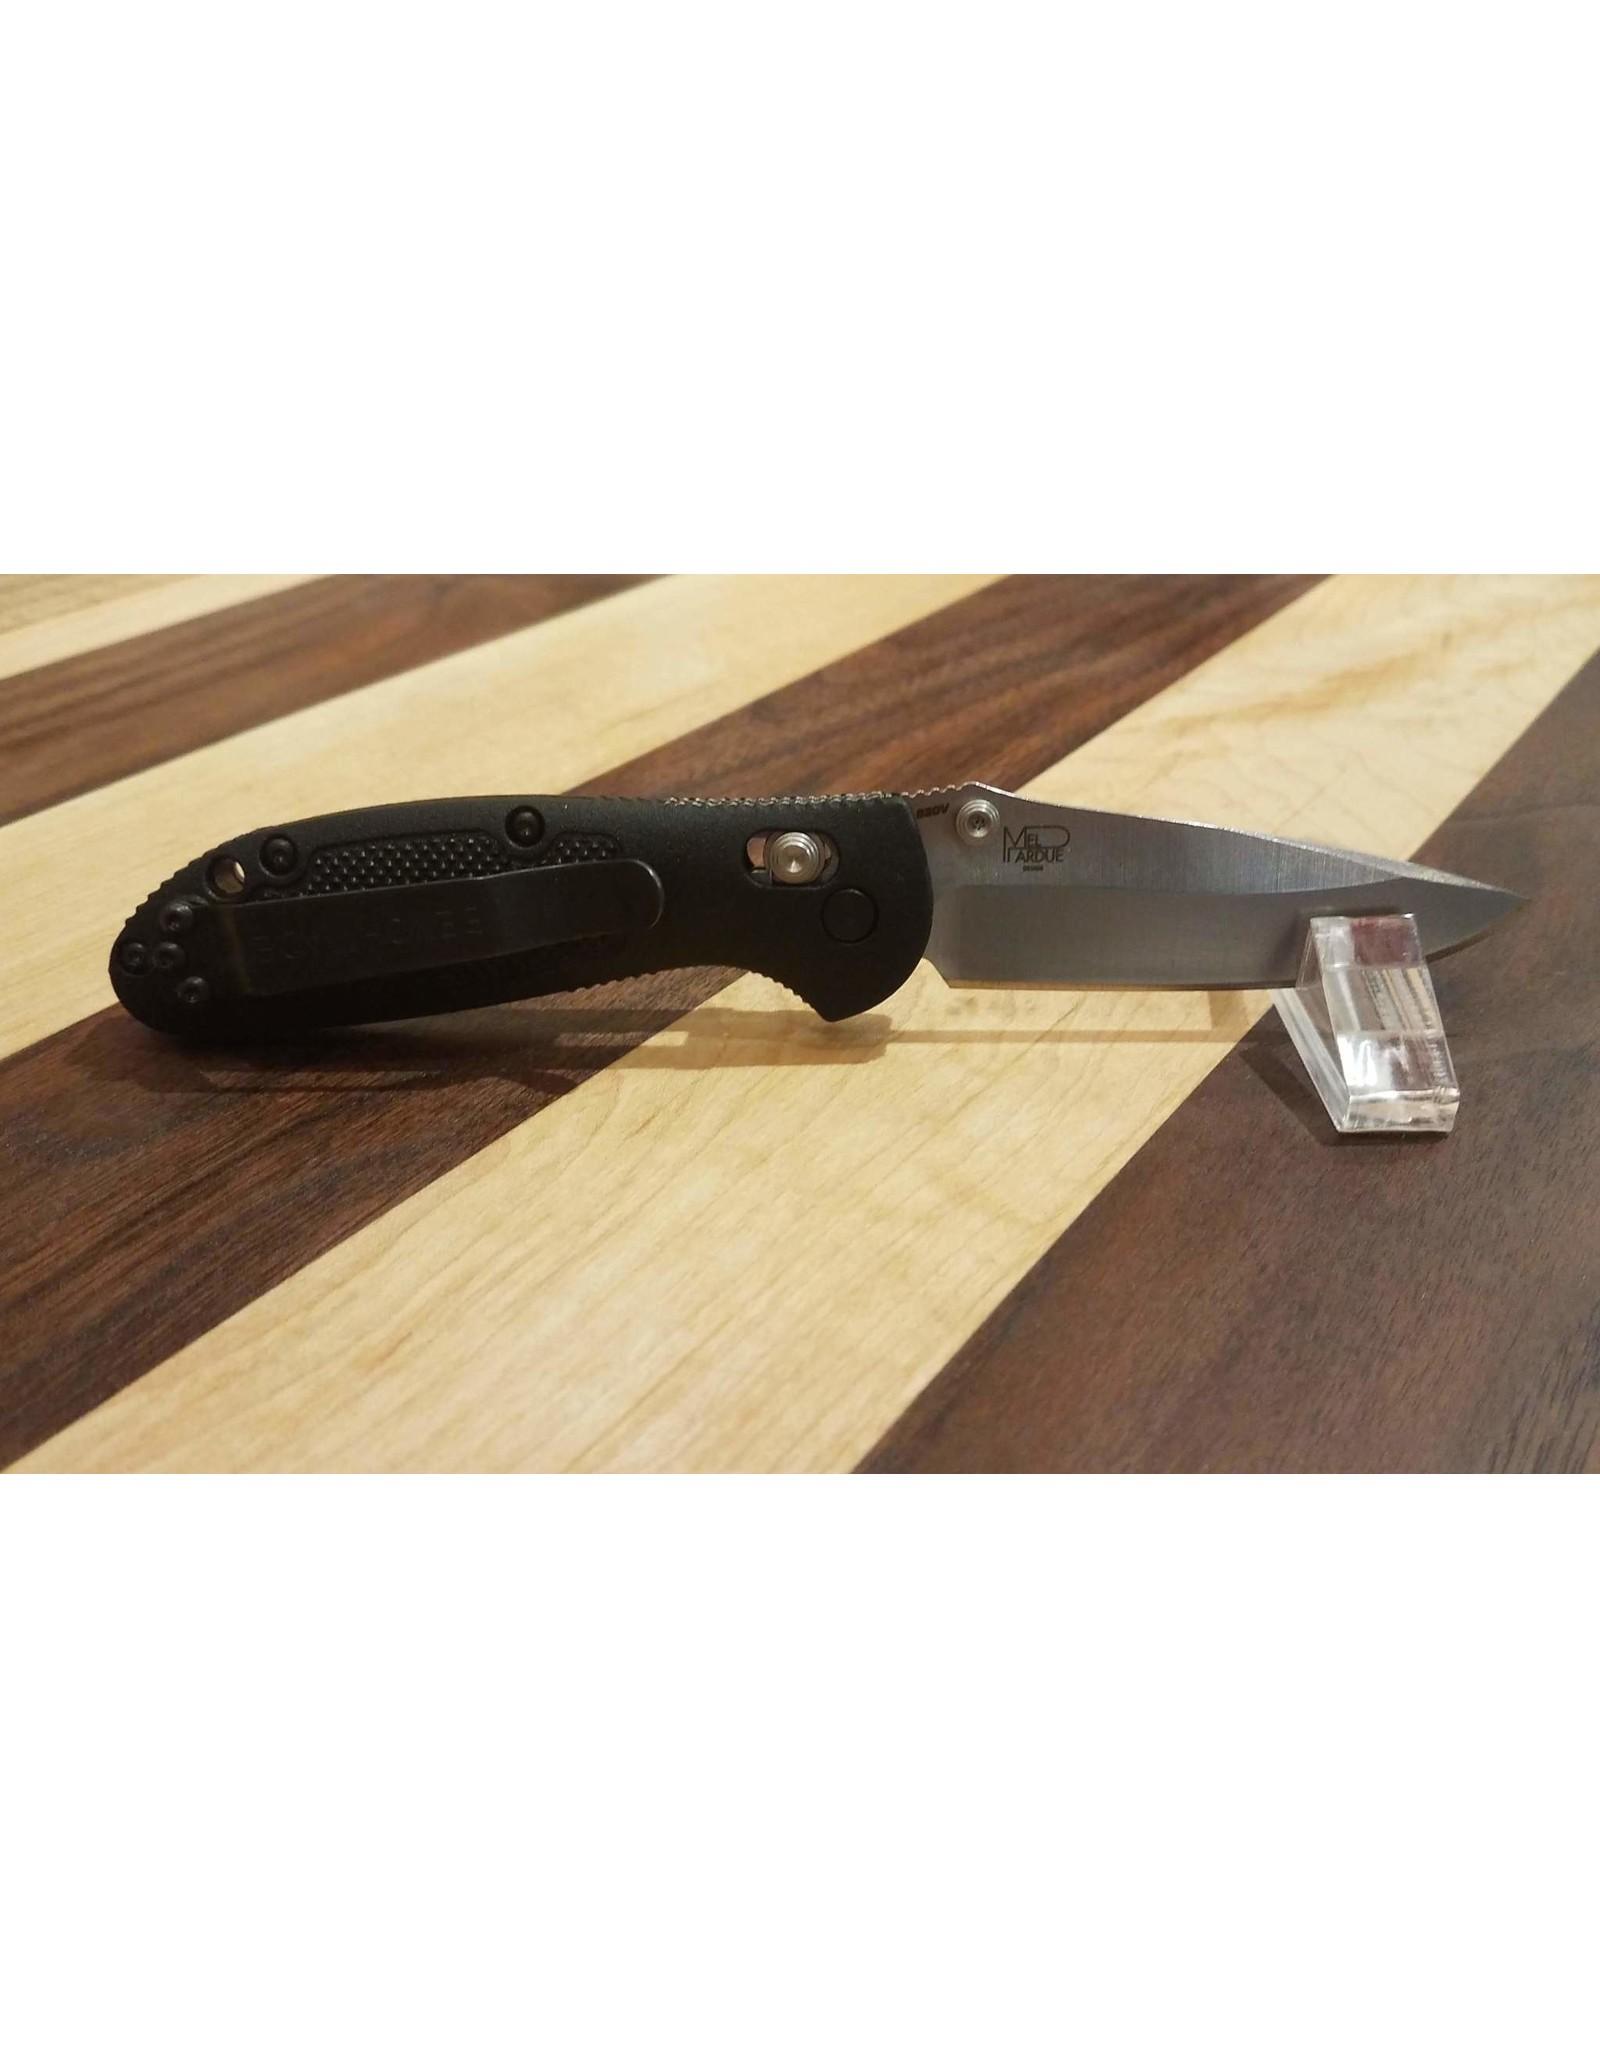 Benchmade Mini Griptilian 556-S30V Drop Point w/Thumb Stud